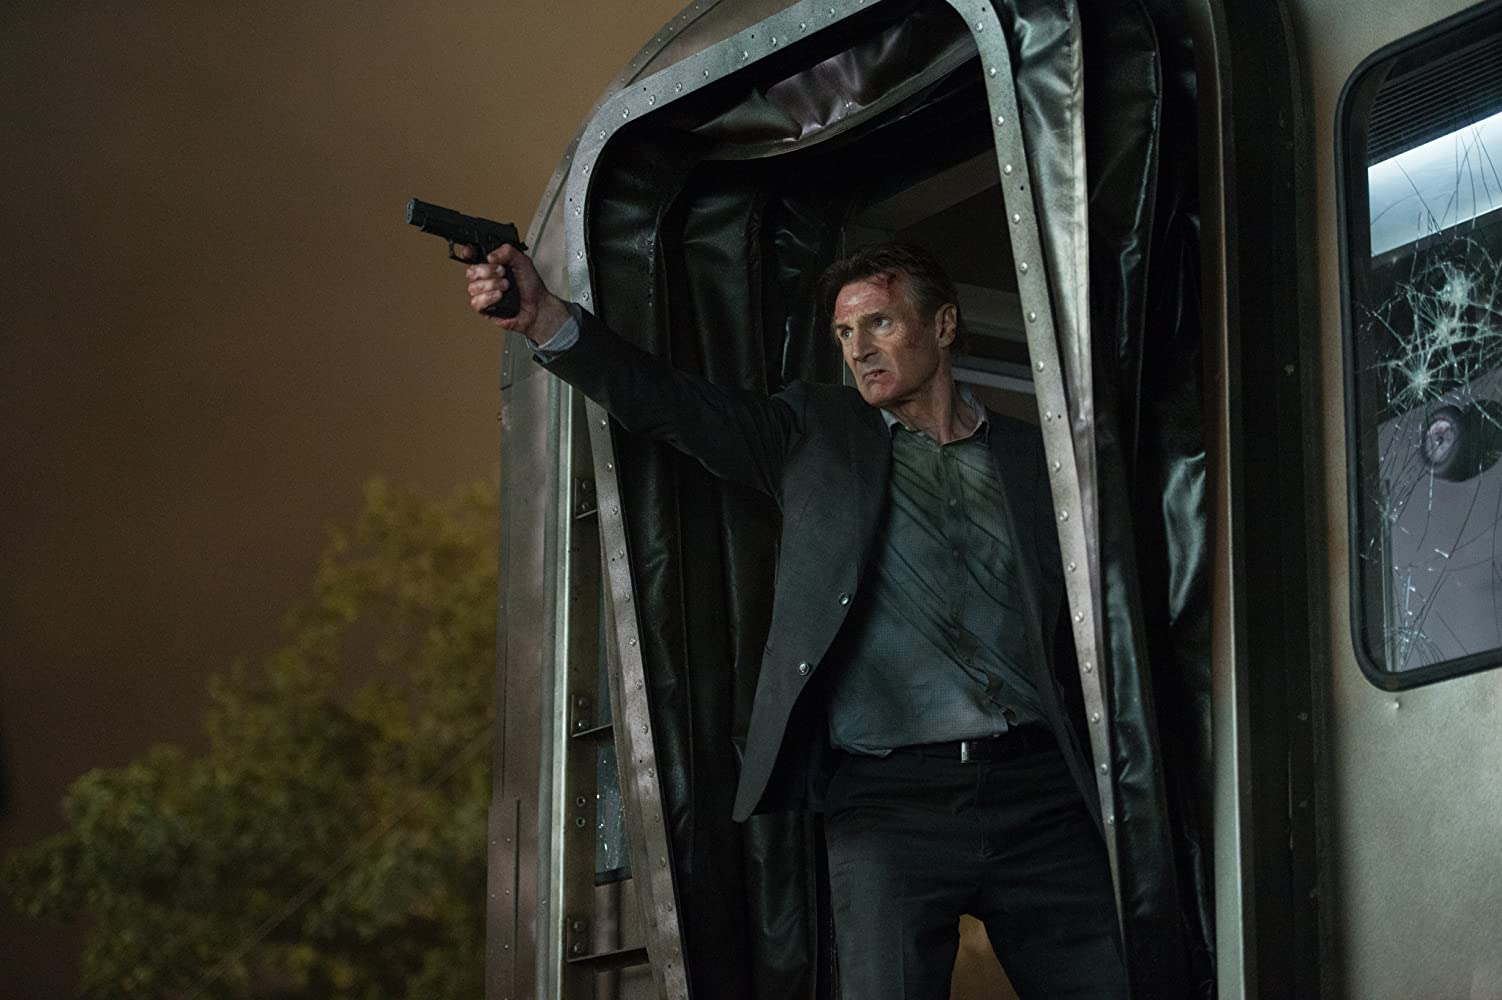 Liam Neeson in The Commuter (2018)